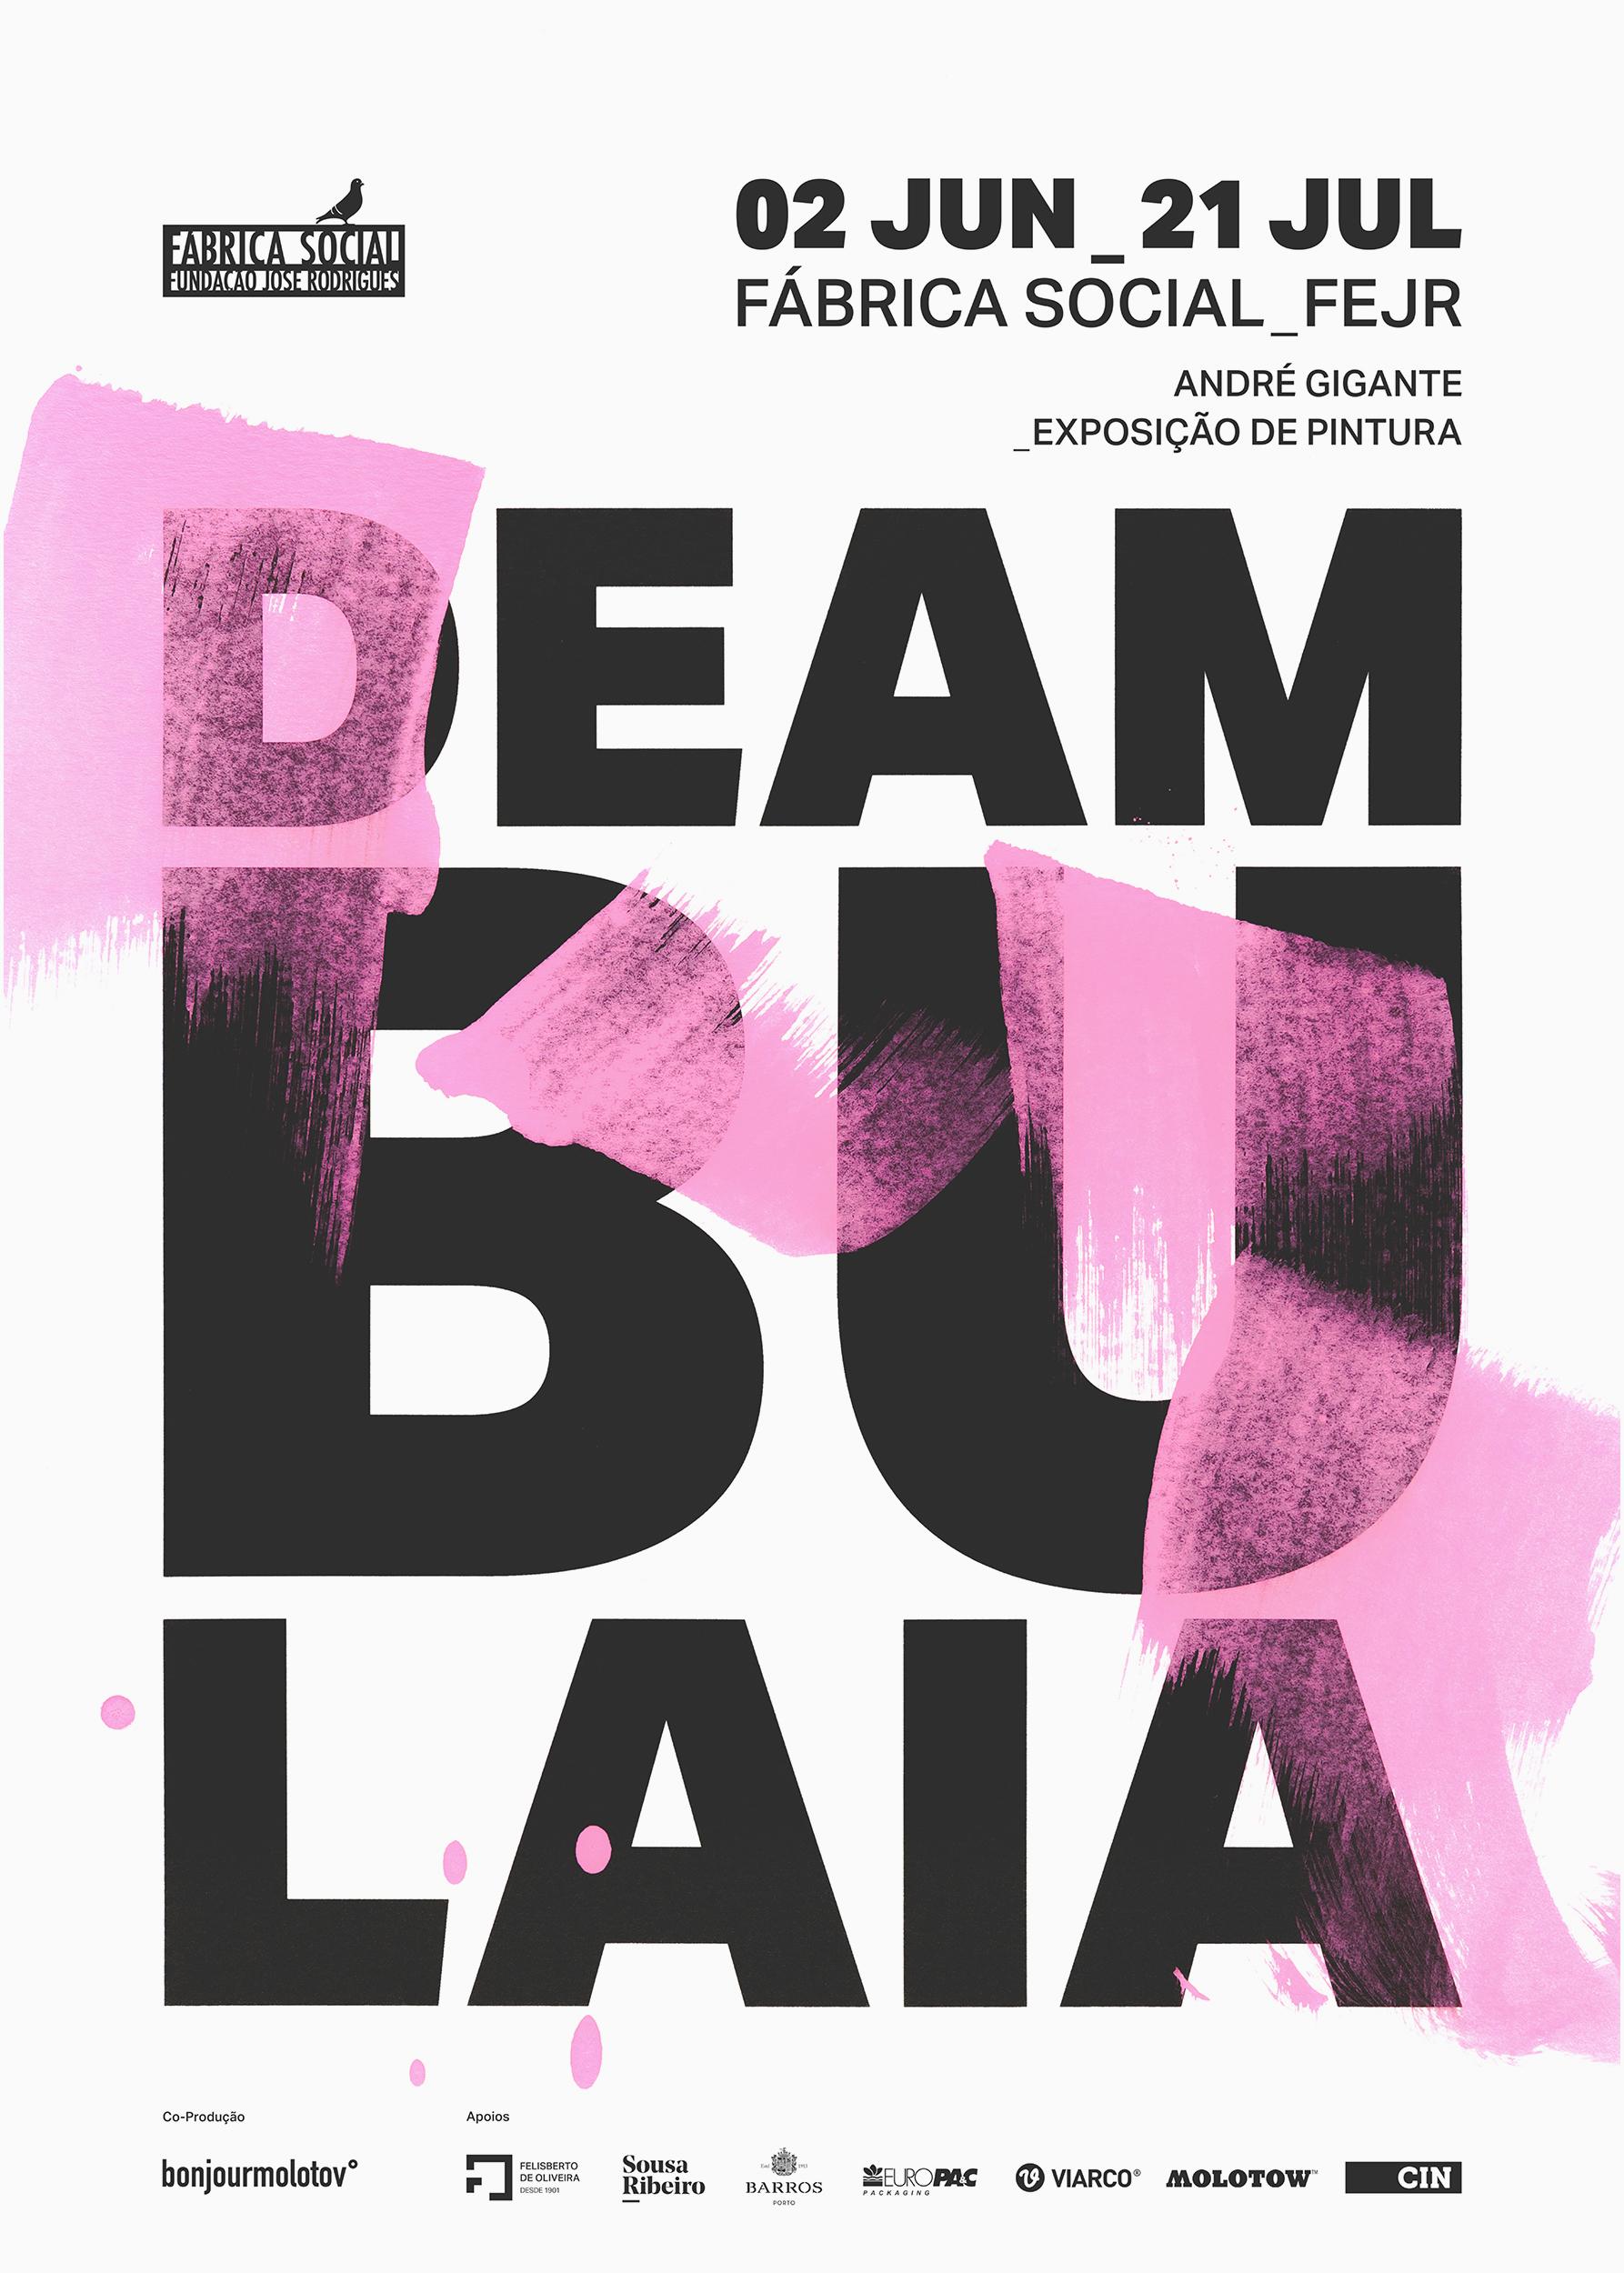 Deambulaia+Exhibition+Andre+Gigante+Pintura+Painting+bonjourmolotov+N.jpg